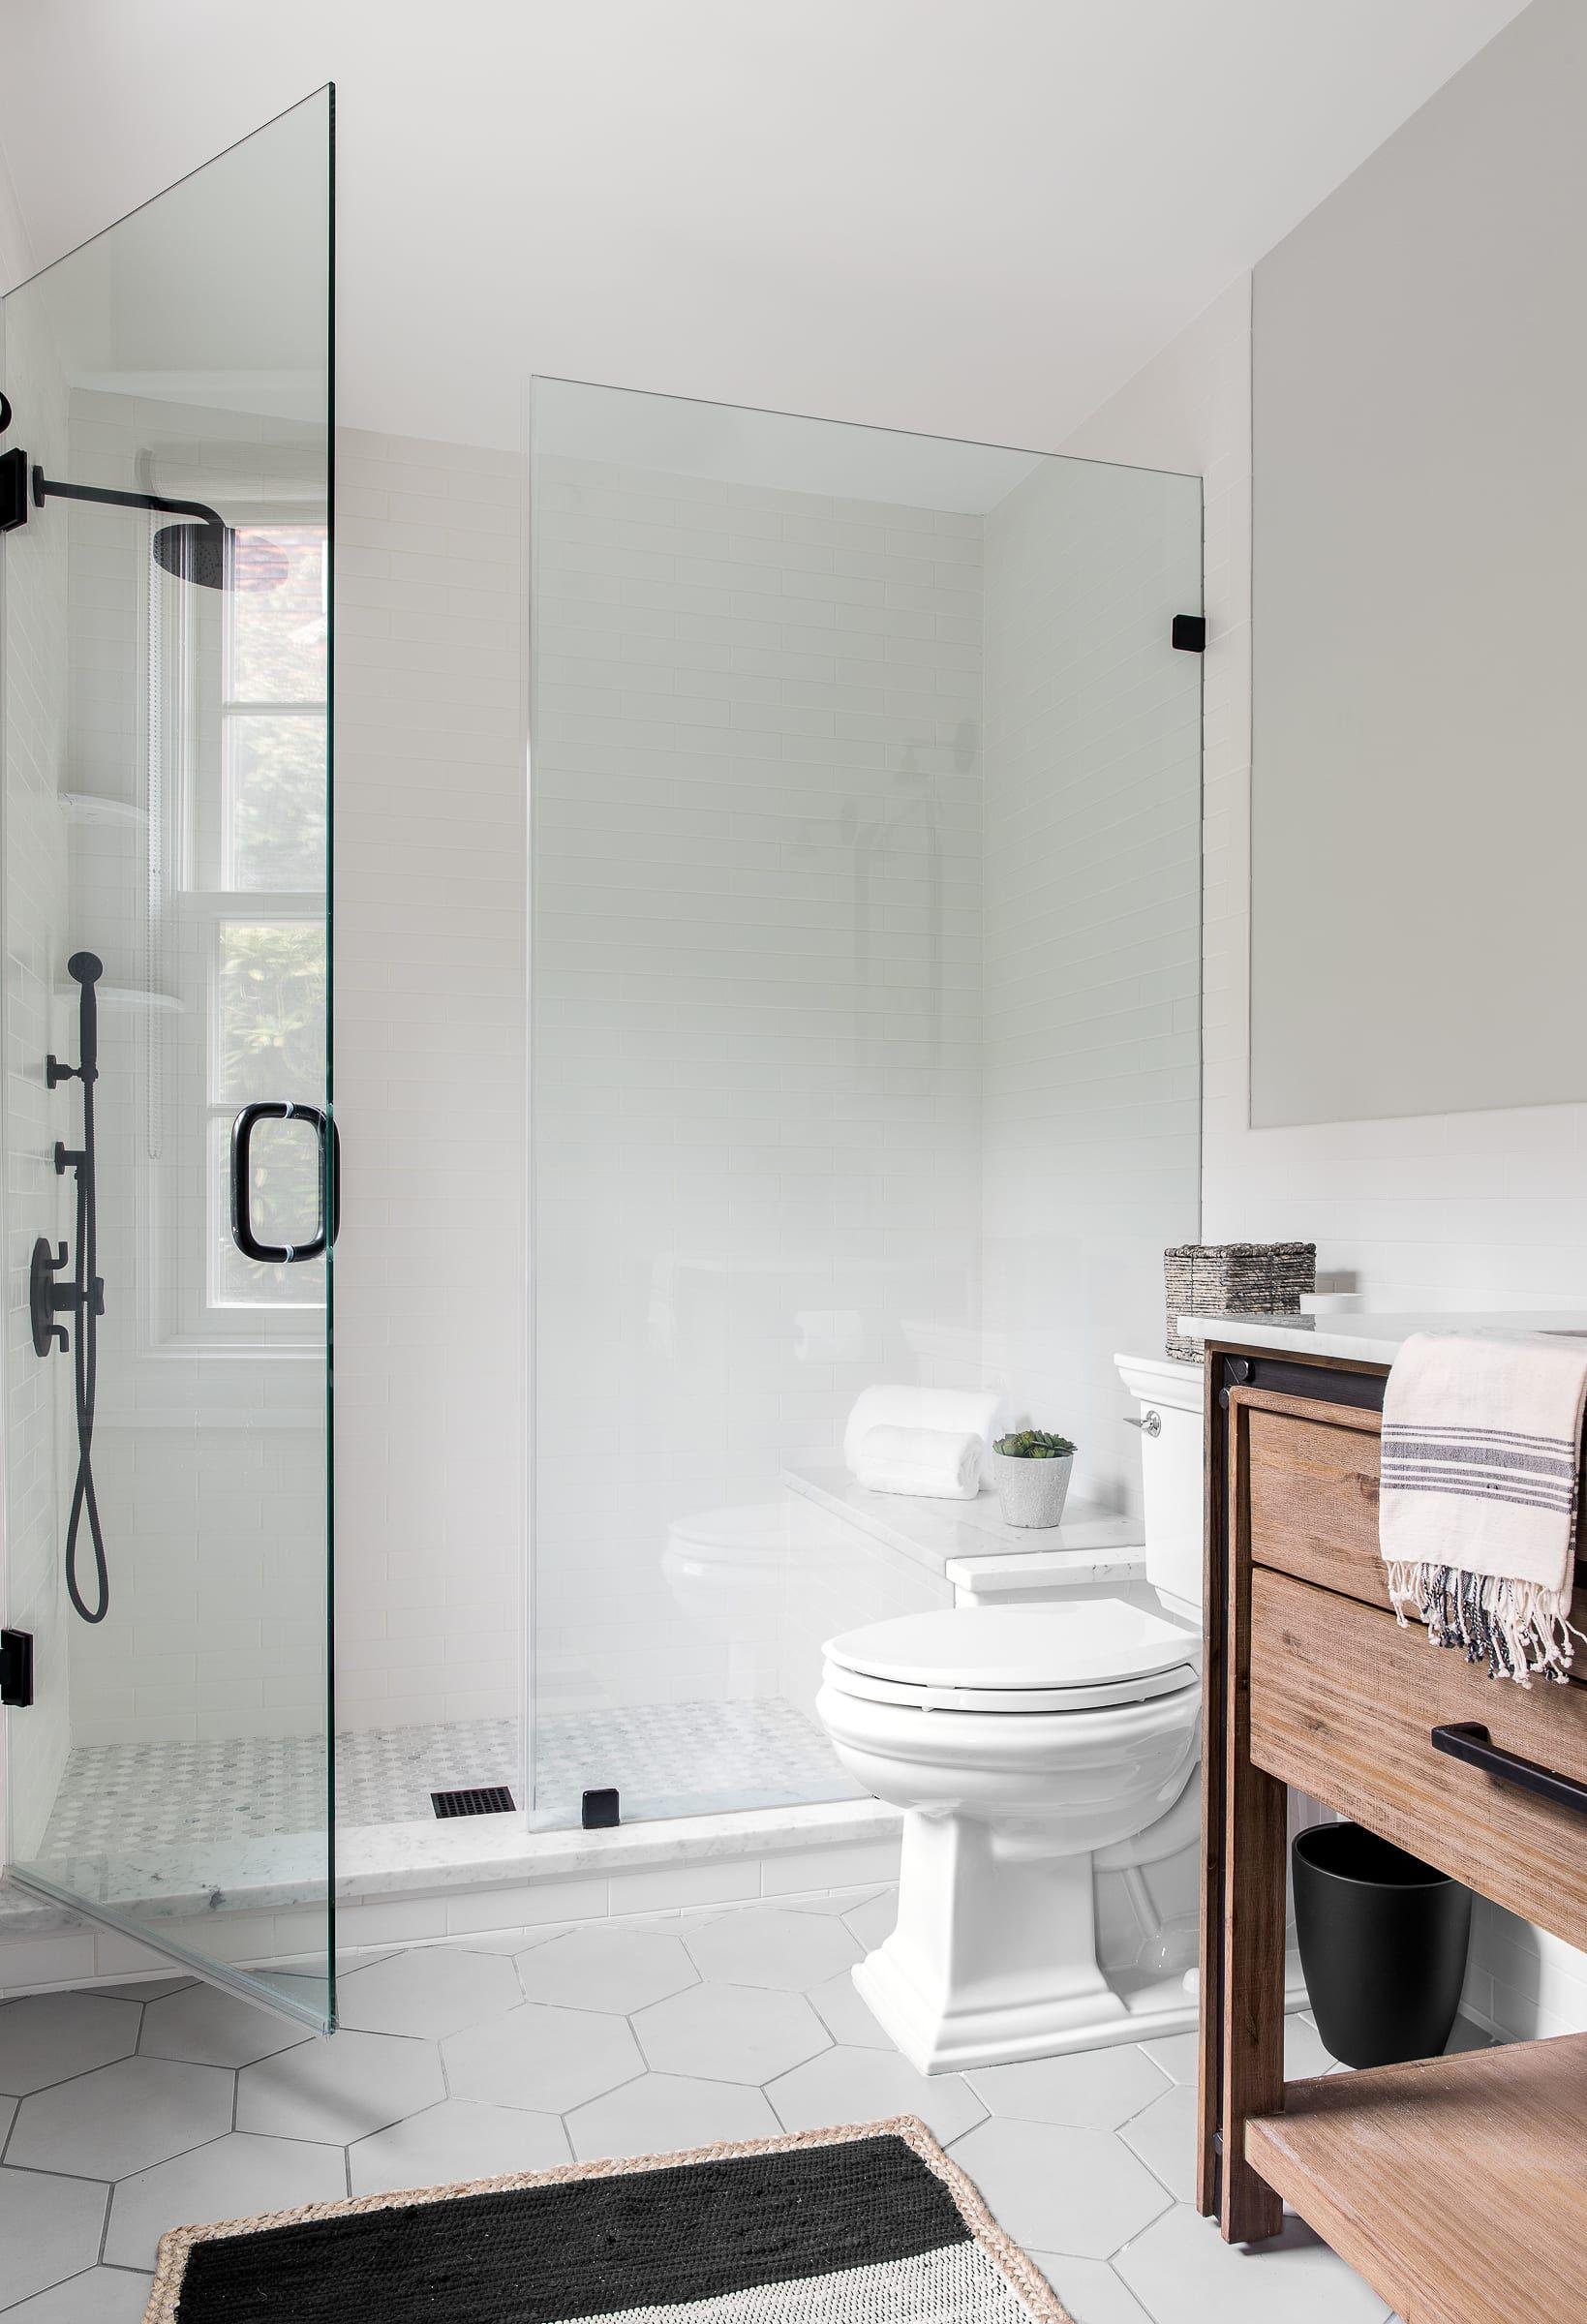 Shiplap Rules In This Port Washington Farmhouse By Designer Becky Shea Home Renovation Modern Bathroom Home Improvement Loans